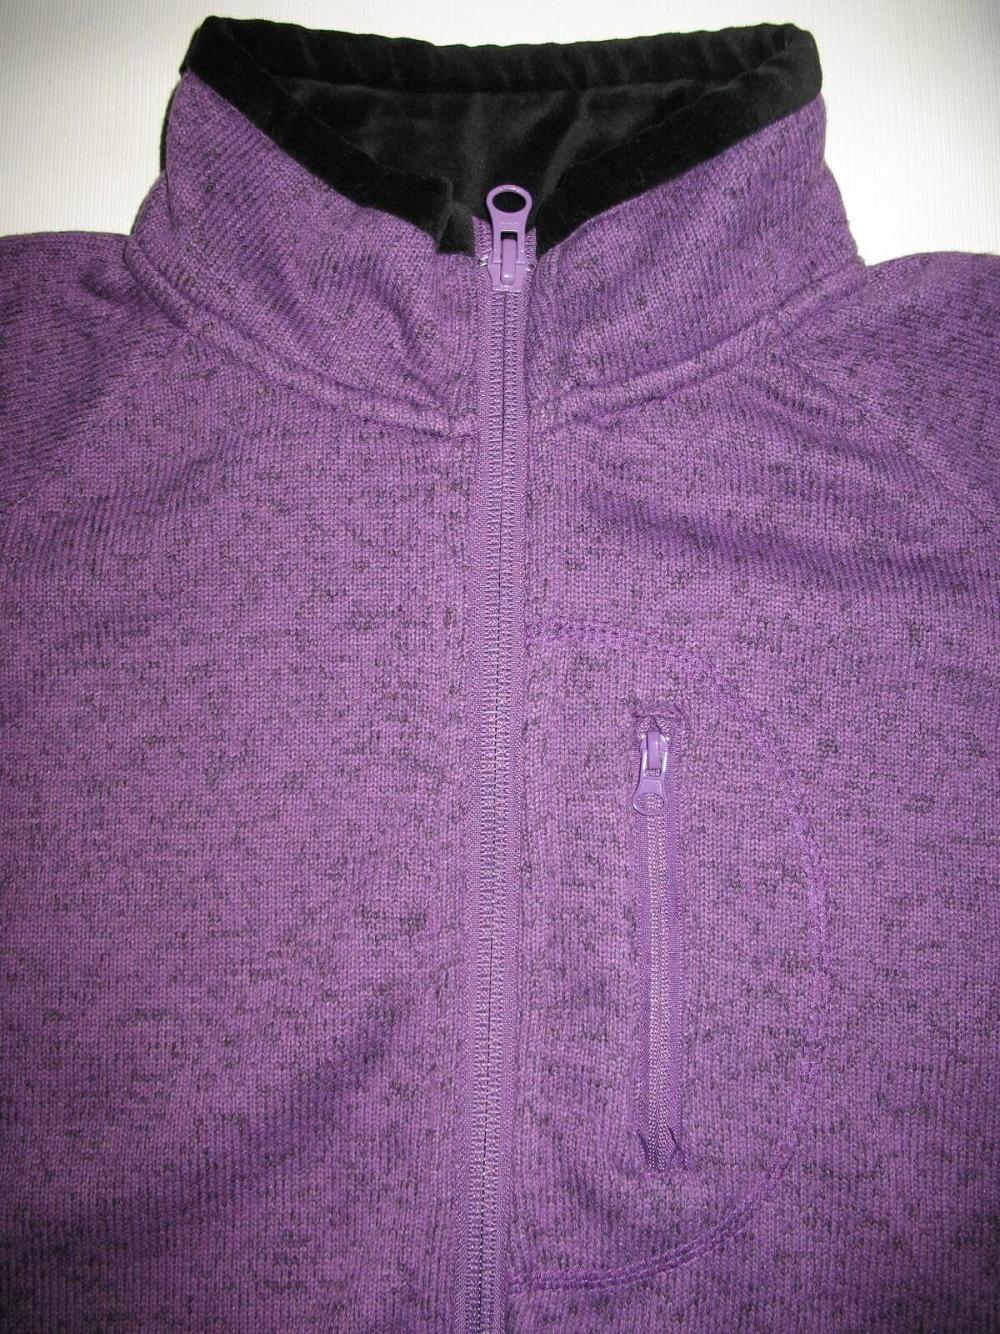 Кофта ATRIUM fleece jacket lady (размер L) - 2